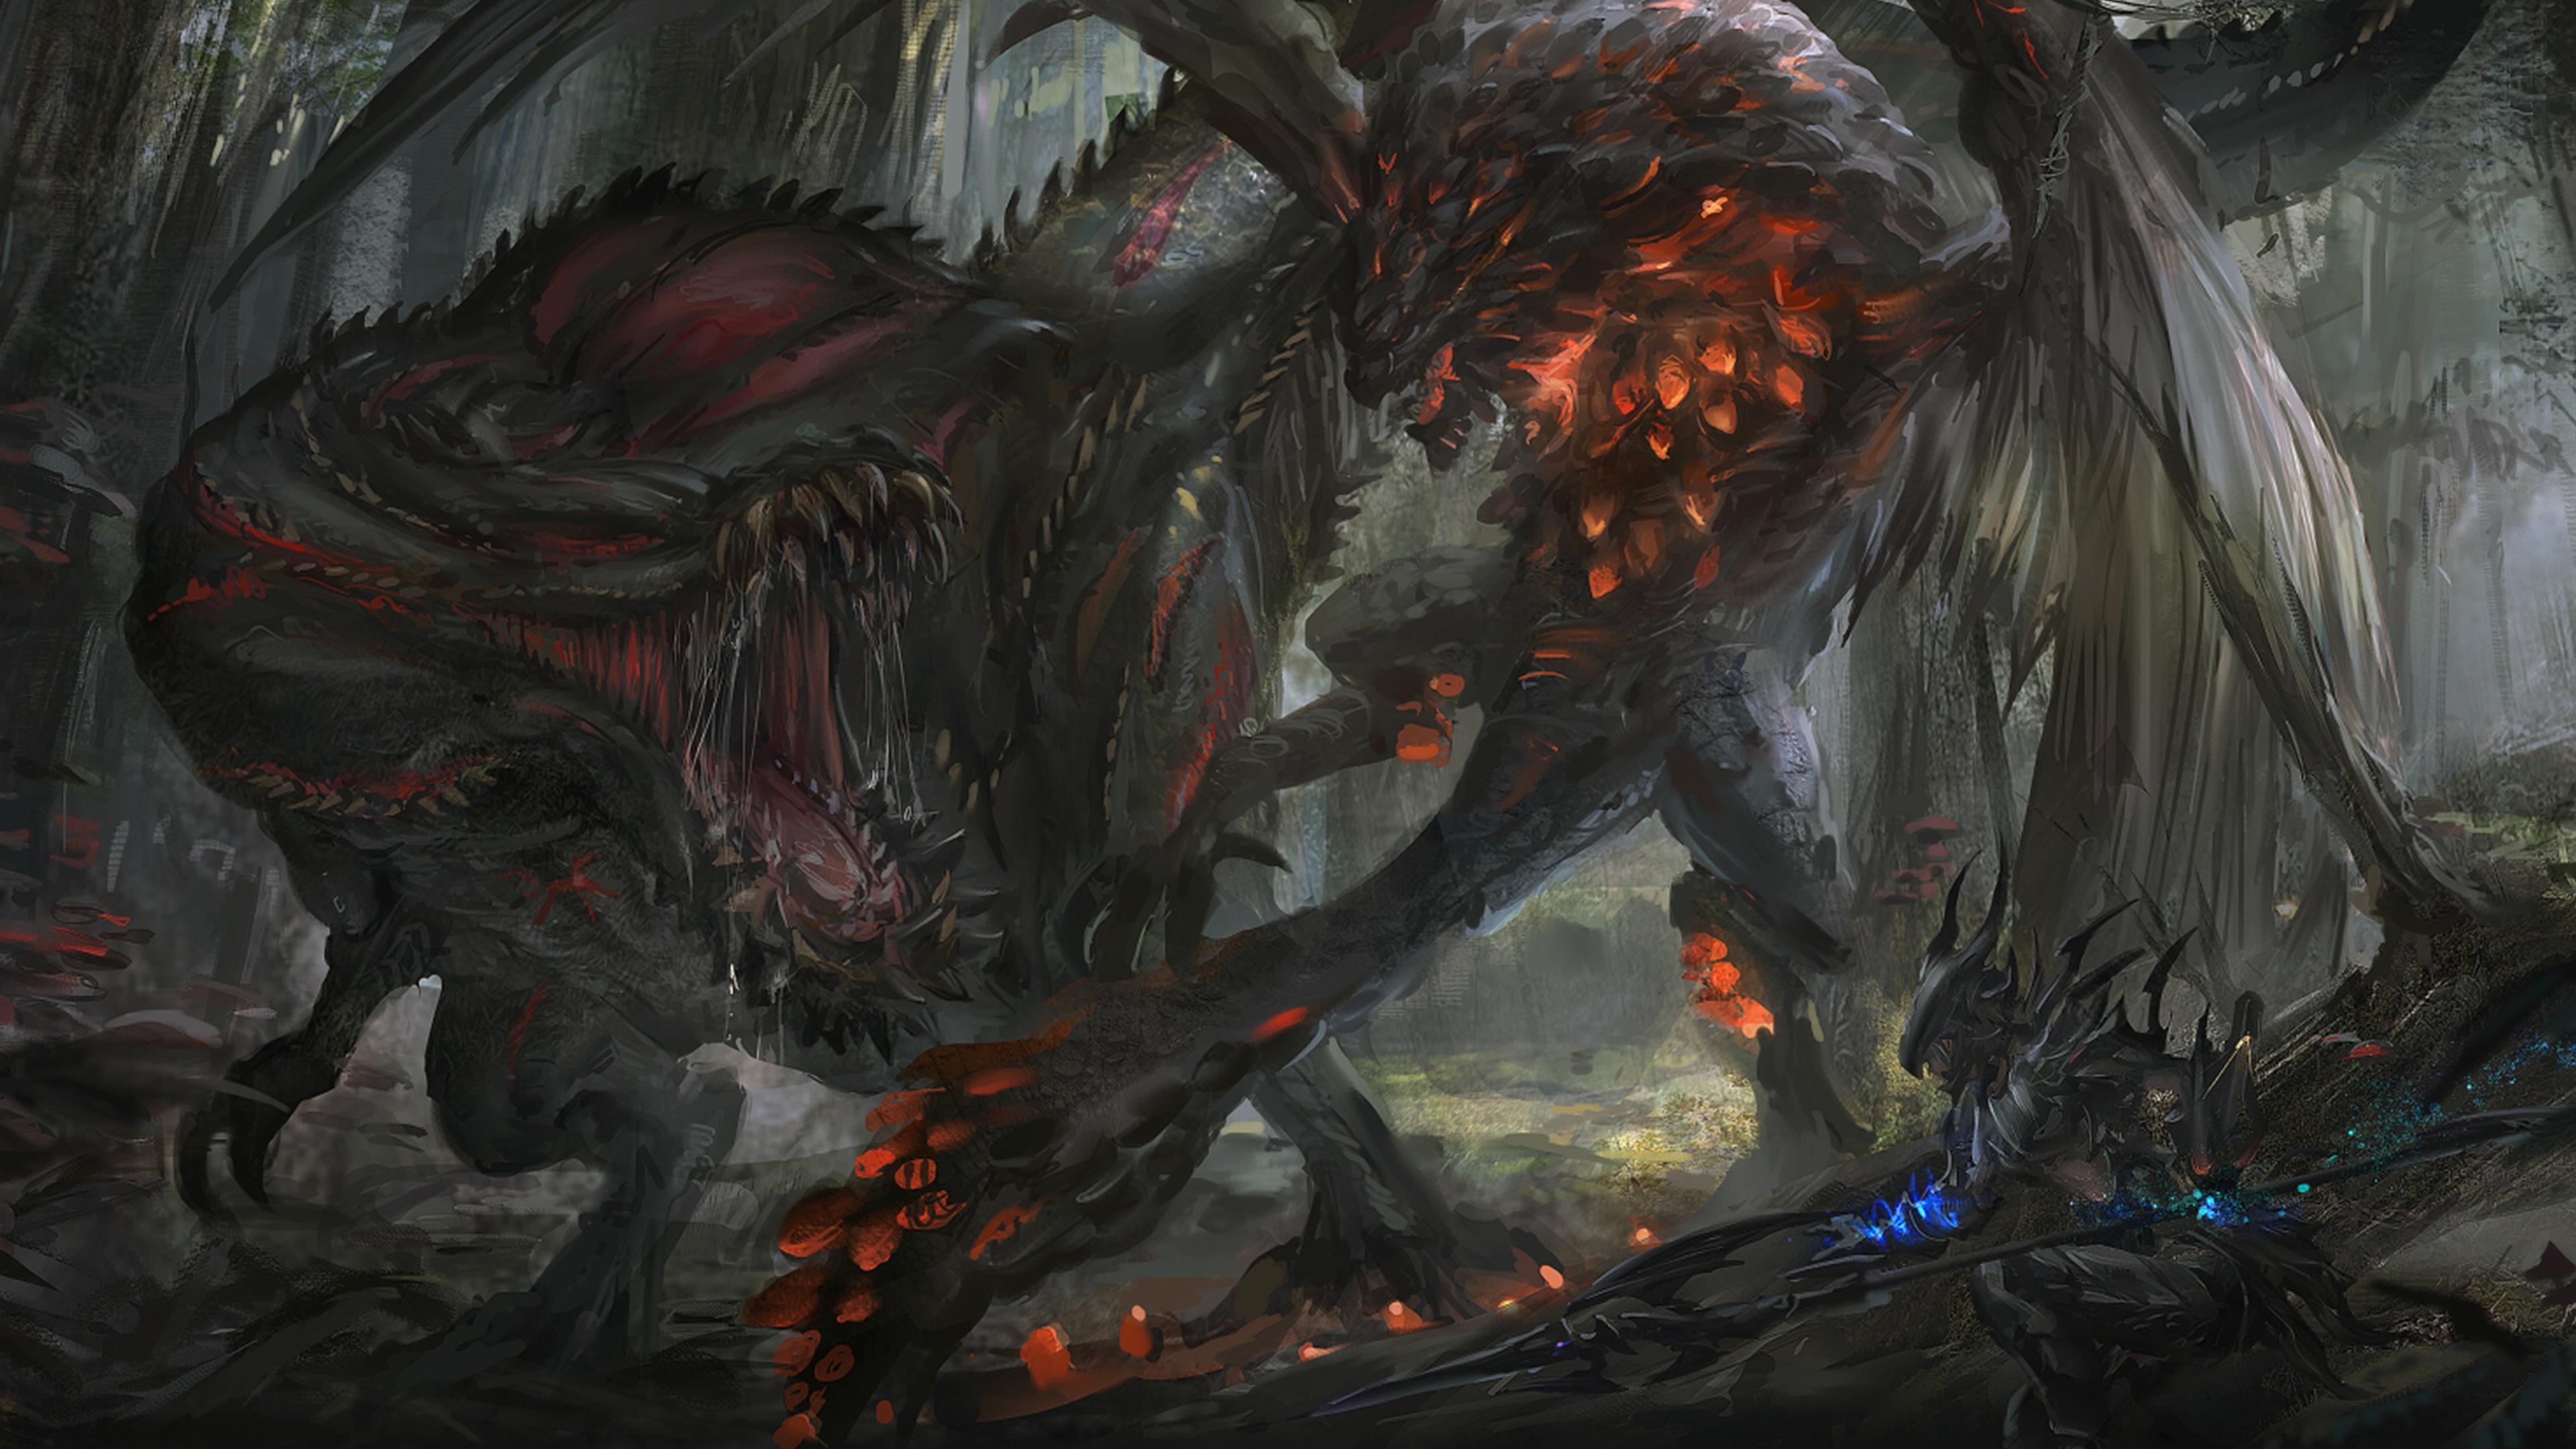 Monster Hunter World Deviljho Wallpapers - Wallpaper Cave